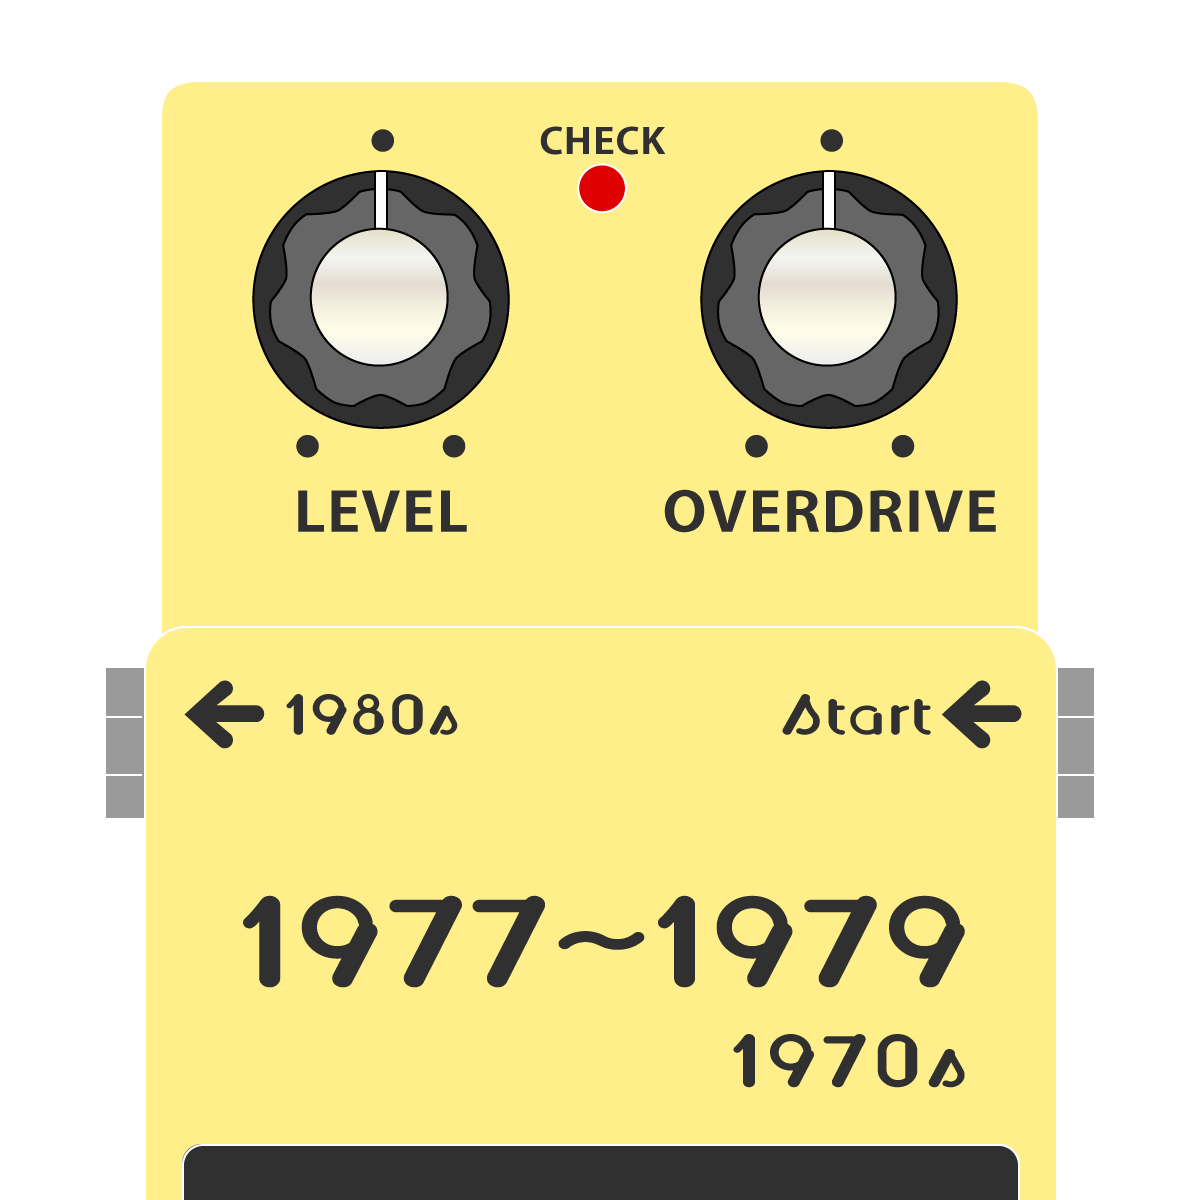 BOSSコンパクトエフェクターの発売時期・発売順まとめ 1970年代